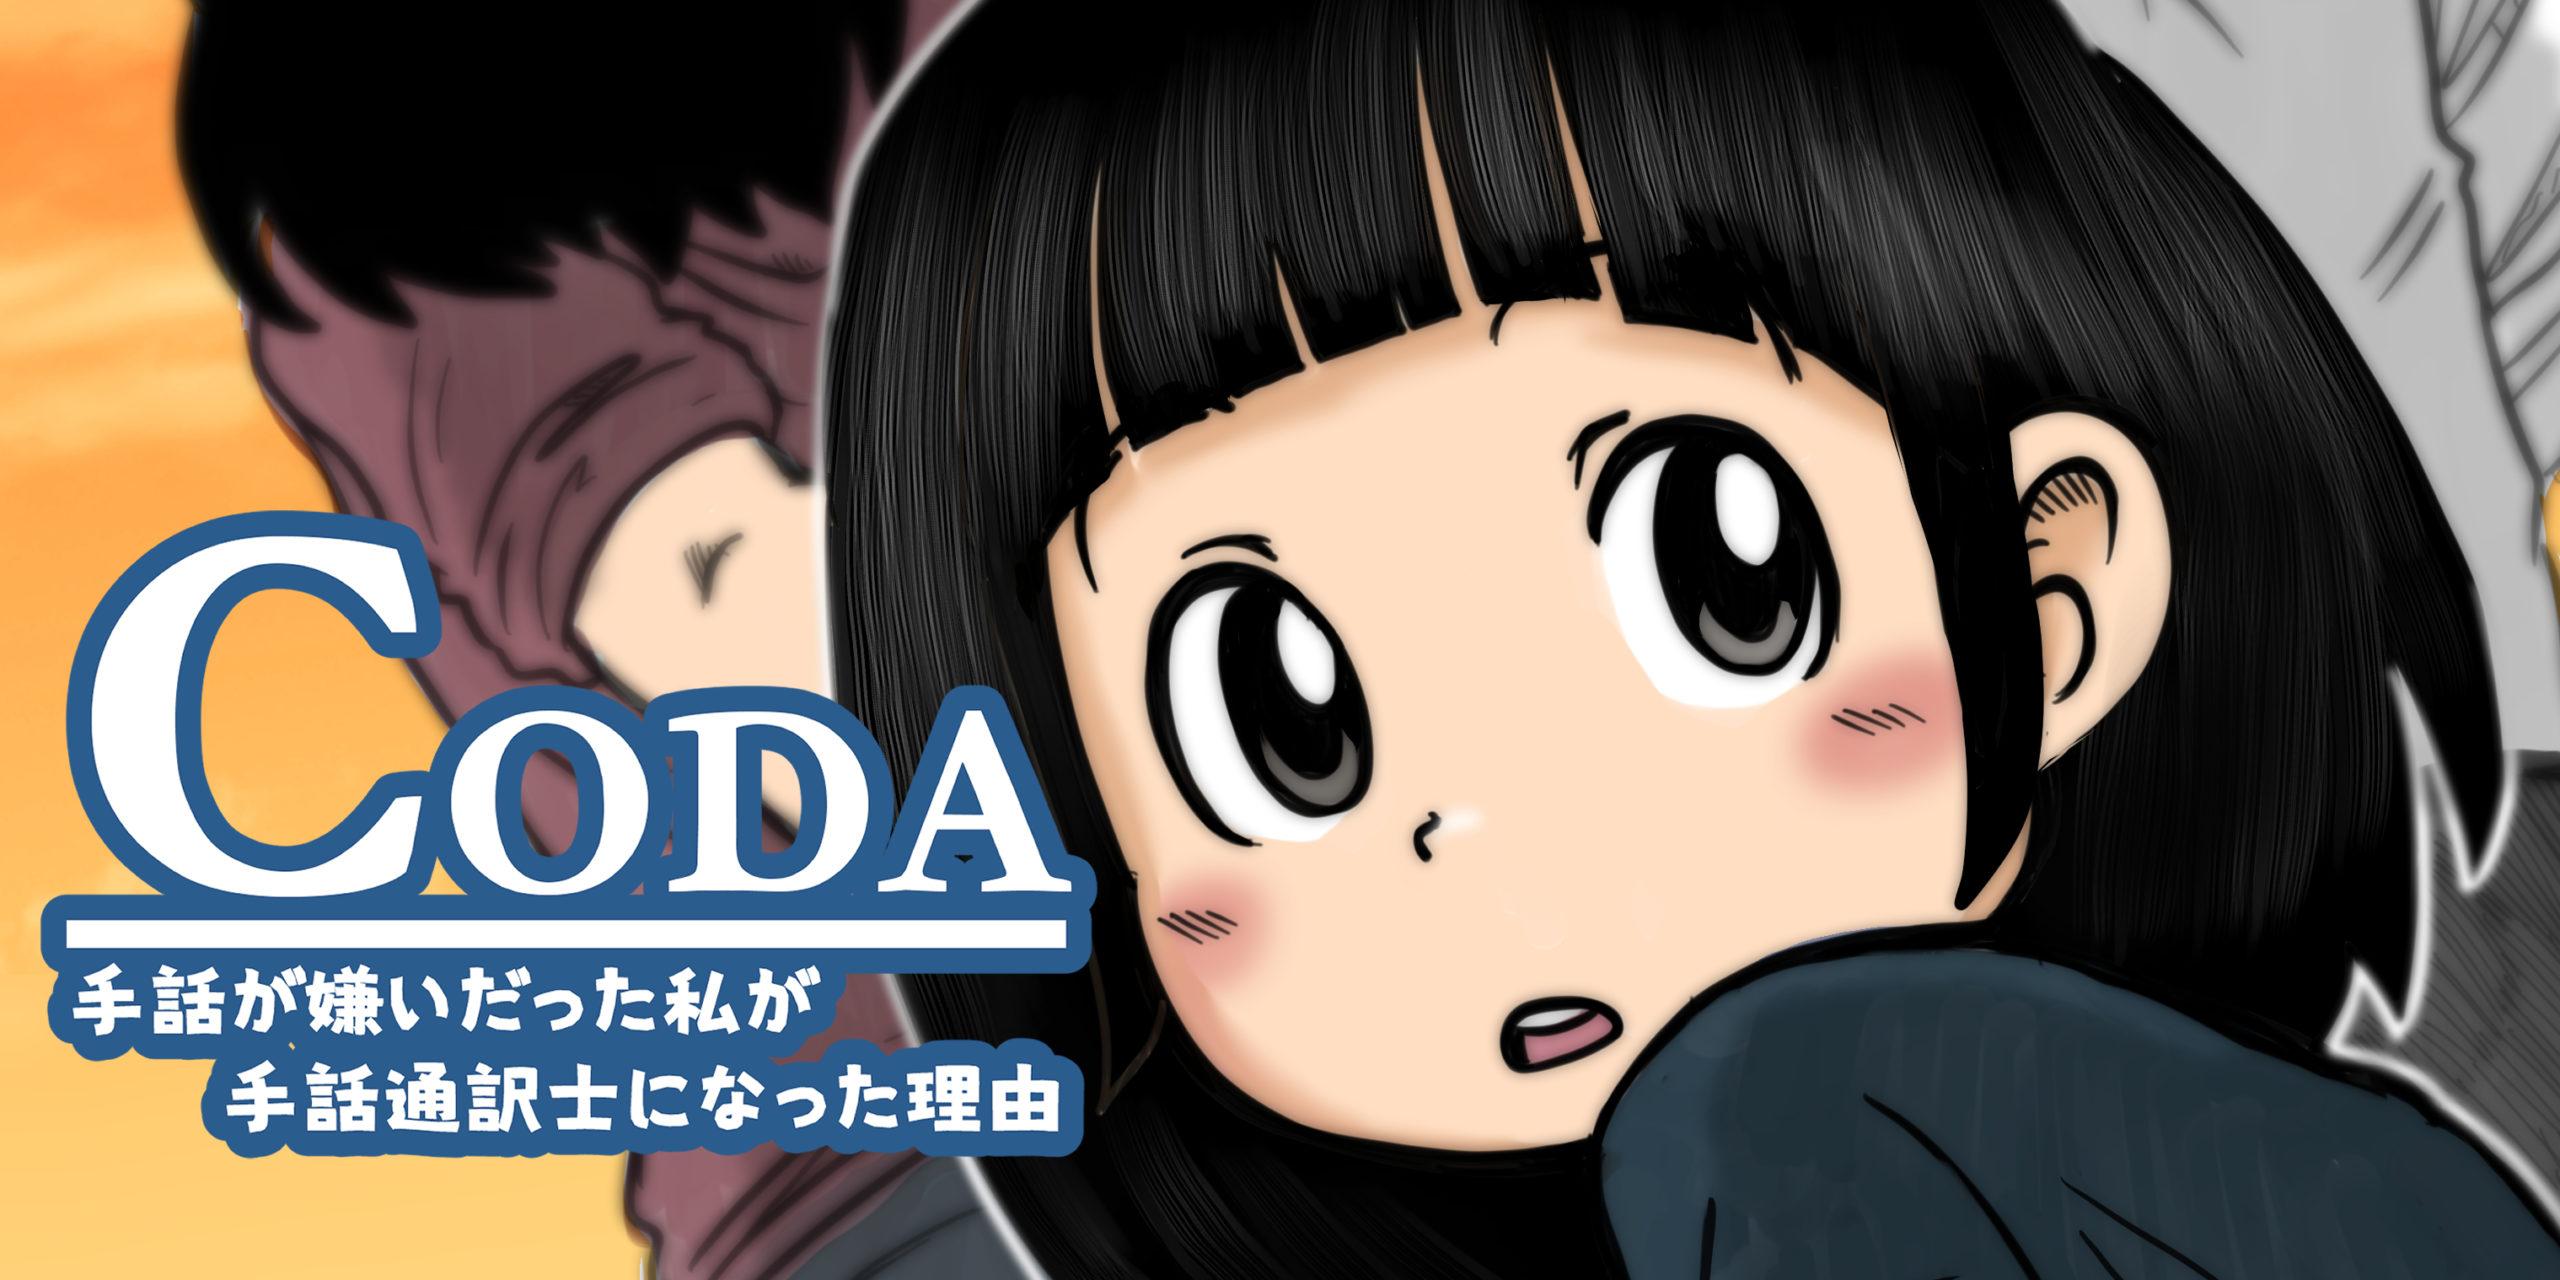 CODA‐コーダ‐